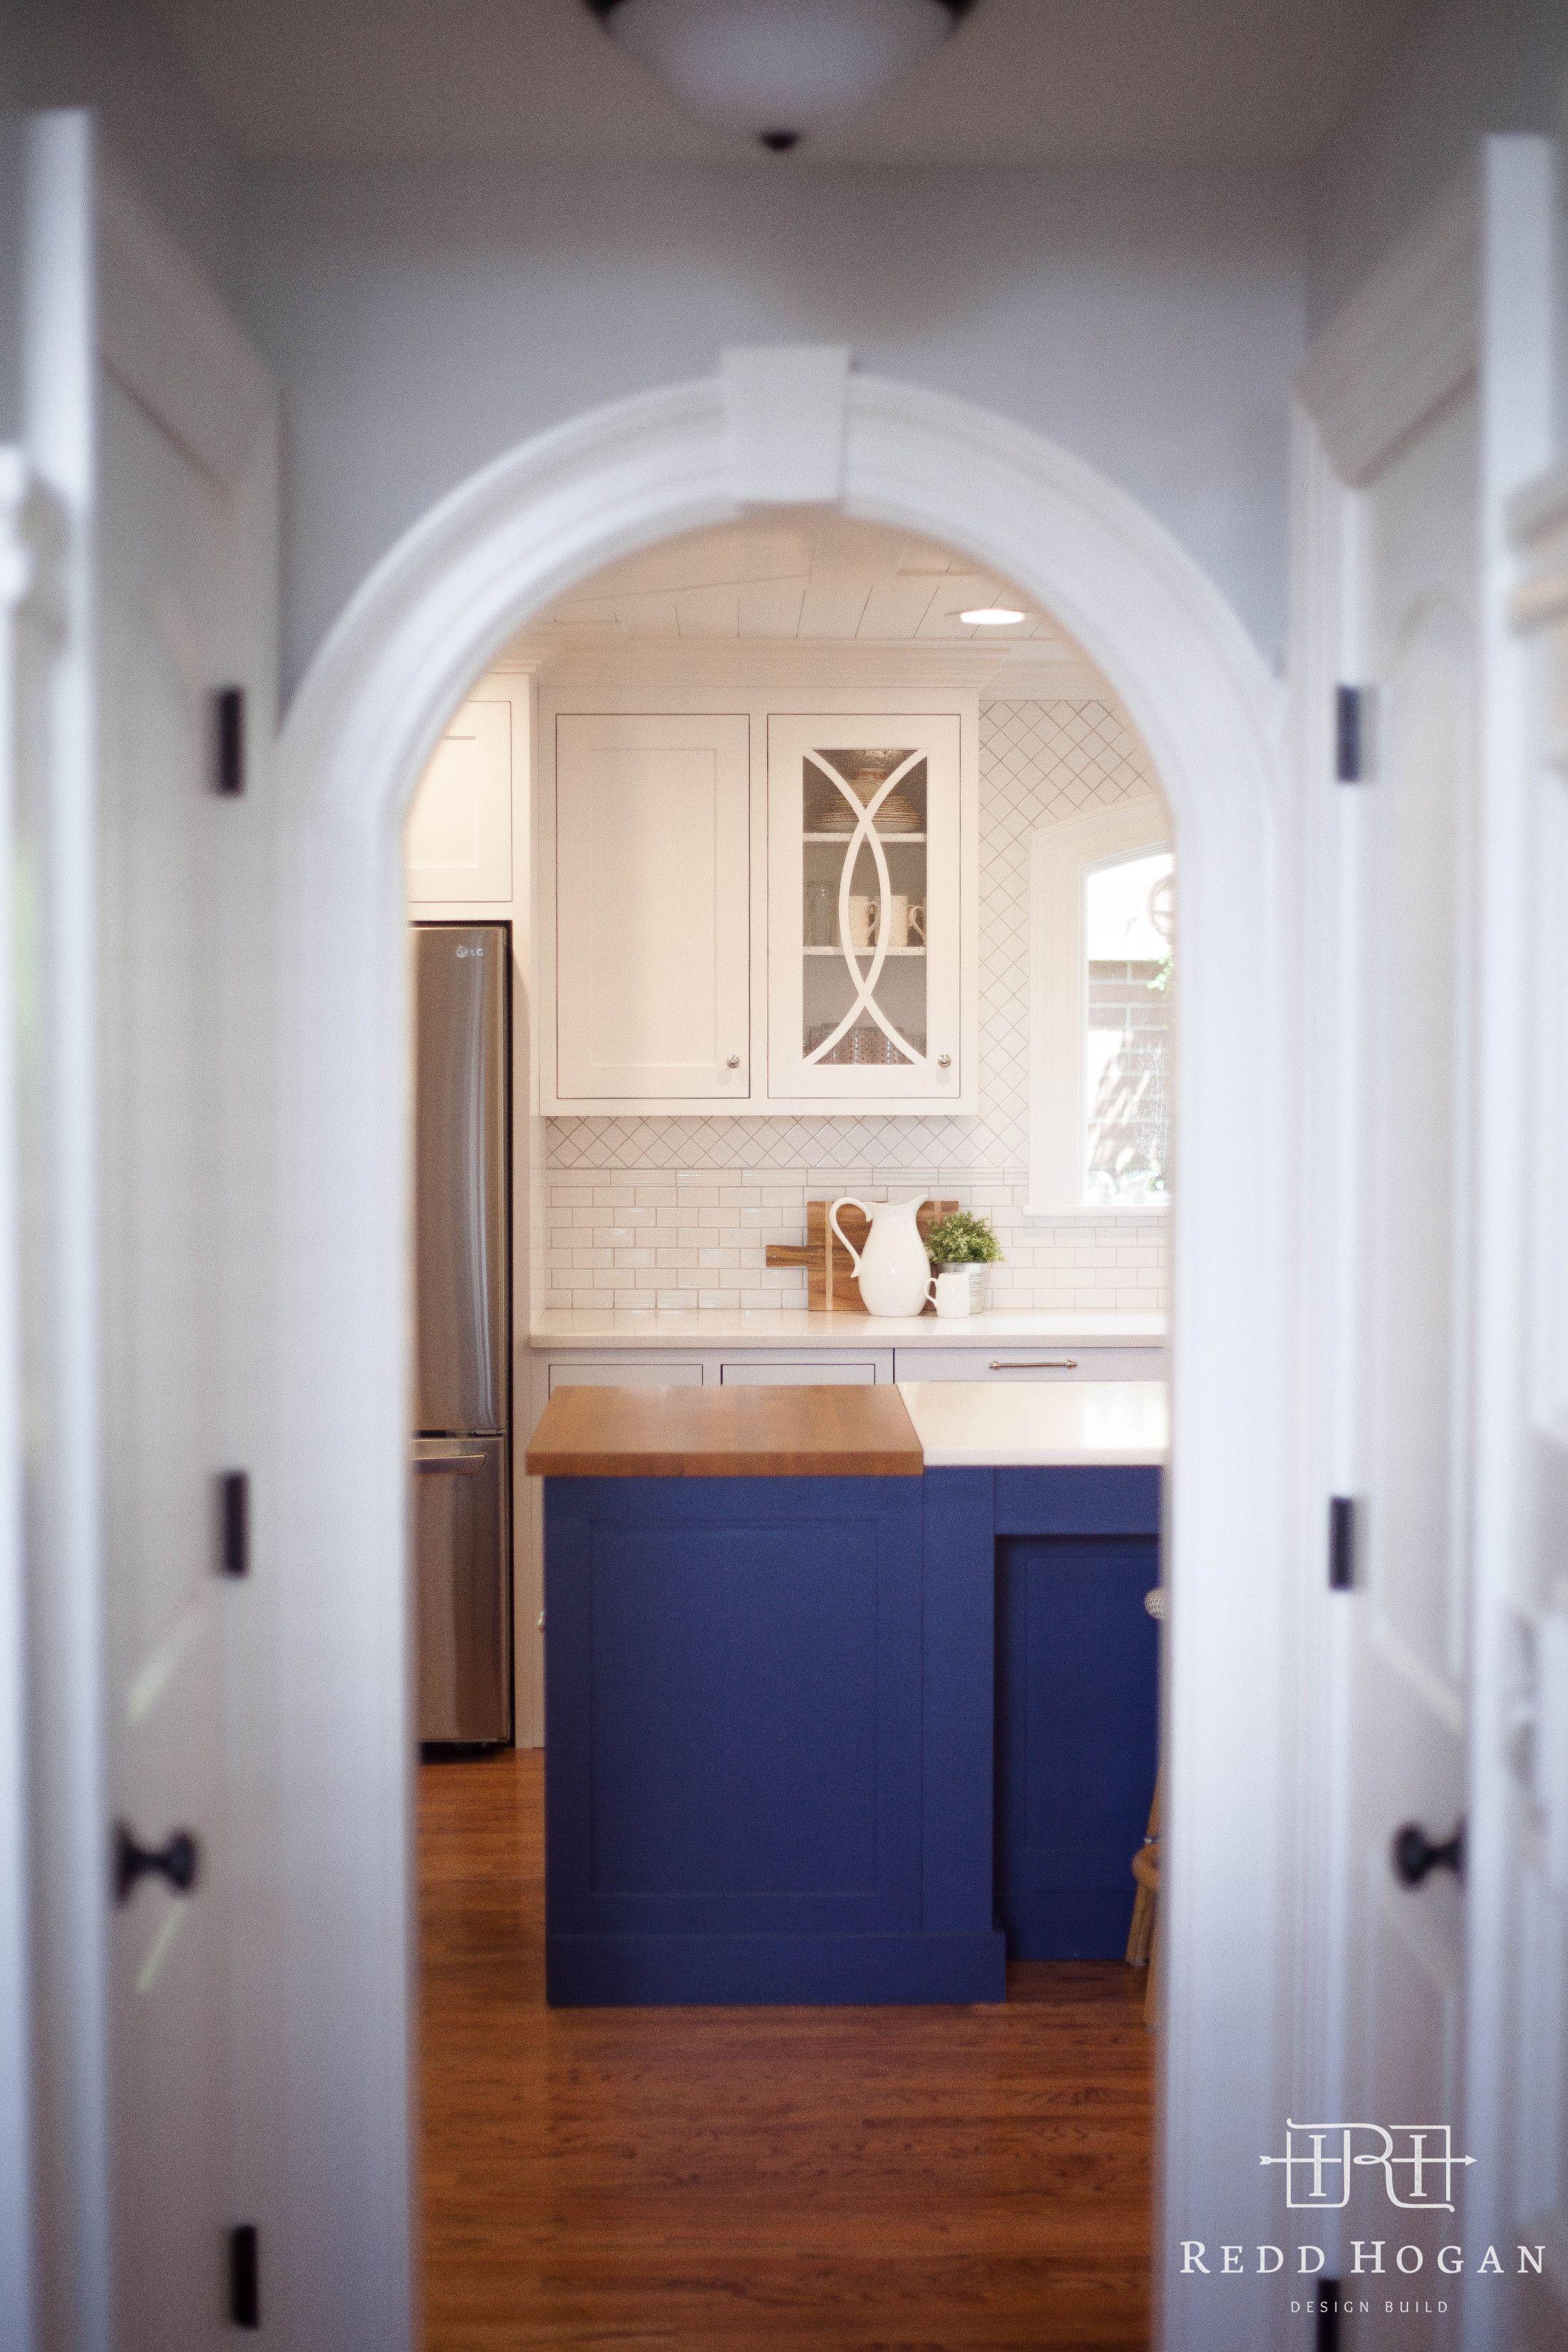 REDD HOGAN DESIGN BUILD | Holladay::Main Floor Remodel  Curved cabinet door detail, arched pass through, keystone, trim, blue island, butcher block, caesarstone, quartz countertop, hardwood, door casing, arched door